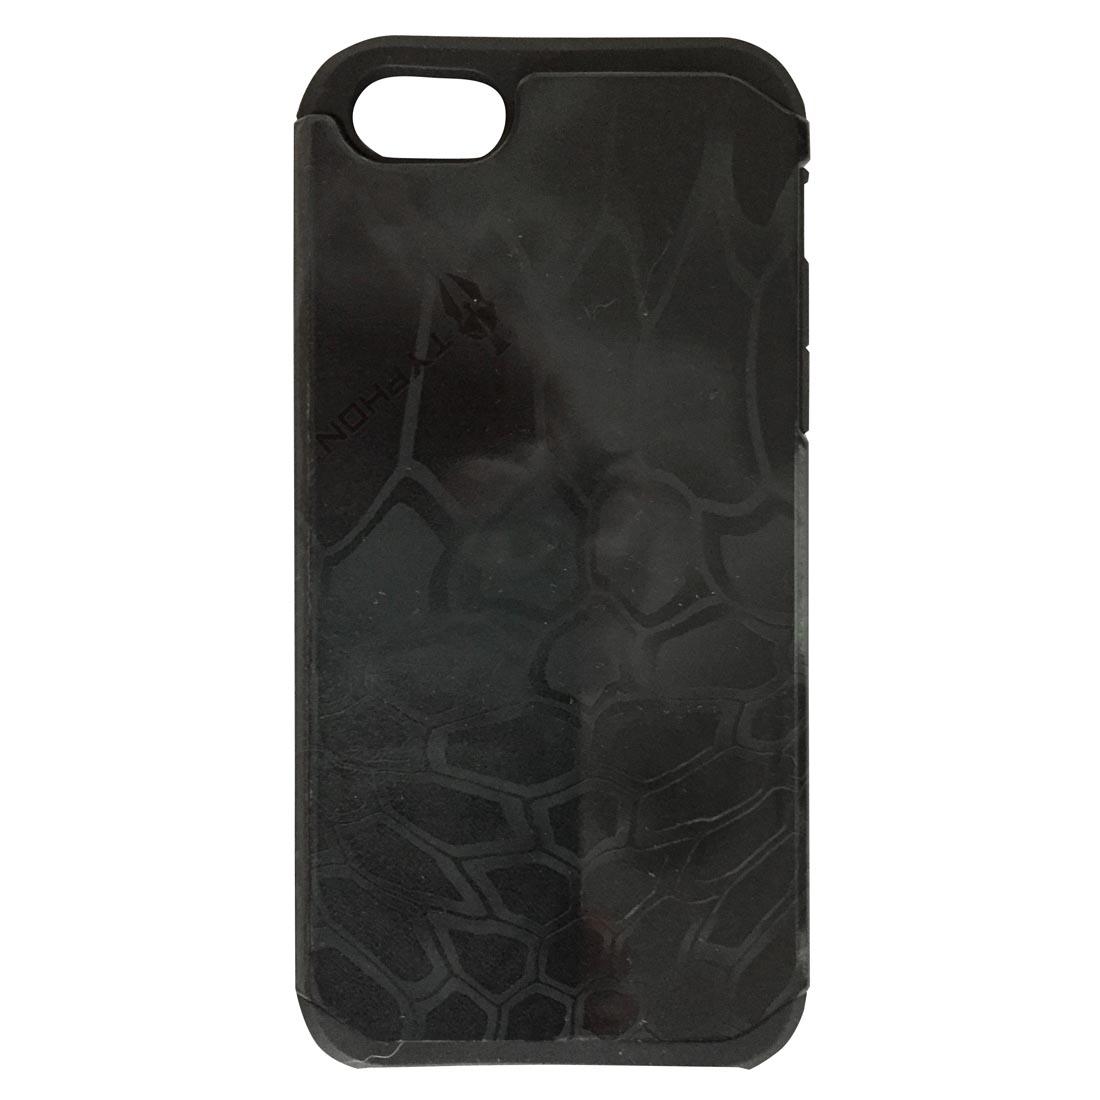 iPhone 5/5s Kryptek Typhon Pattern